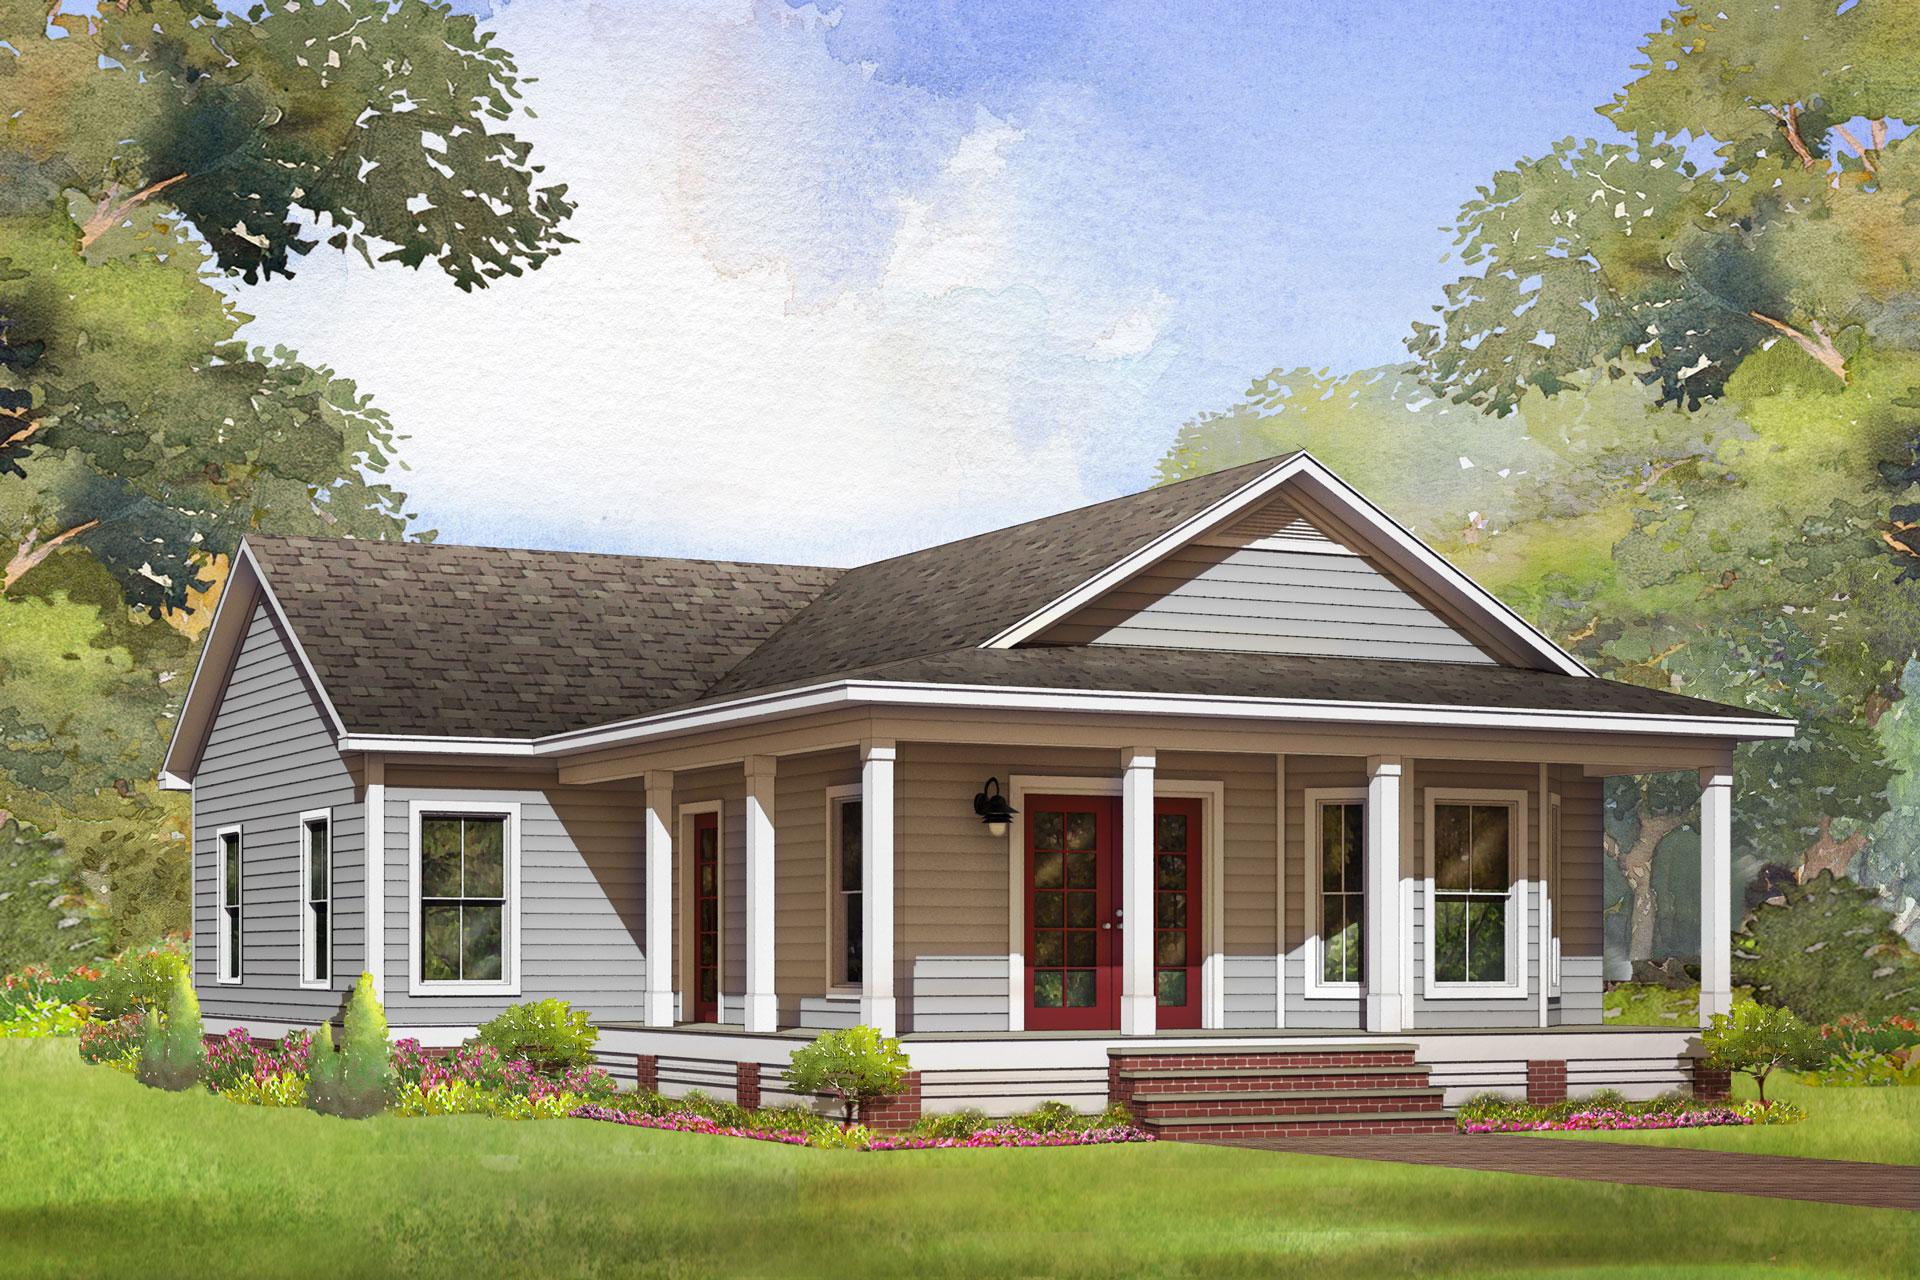 kingsland modular home rendering